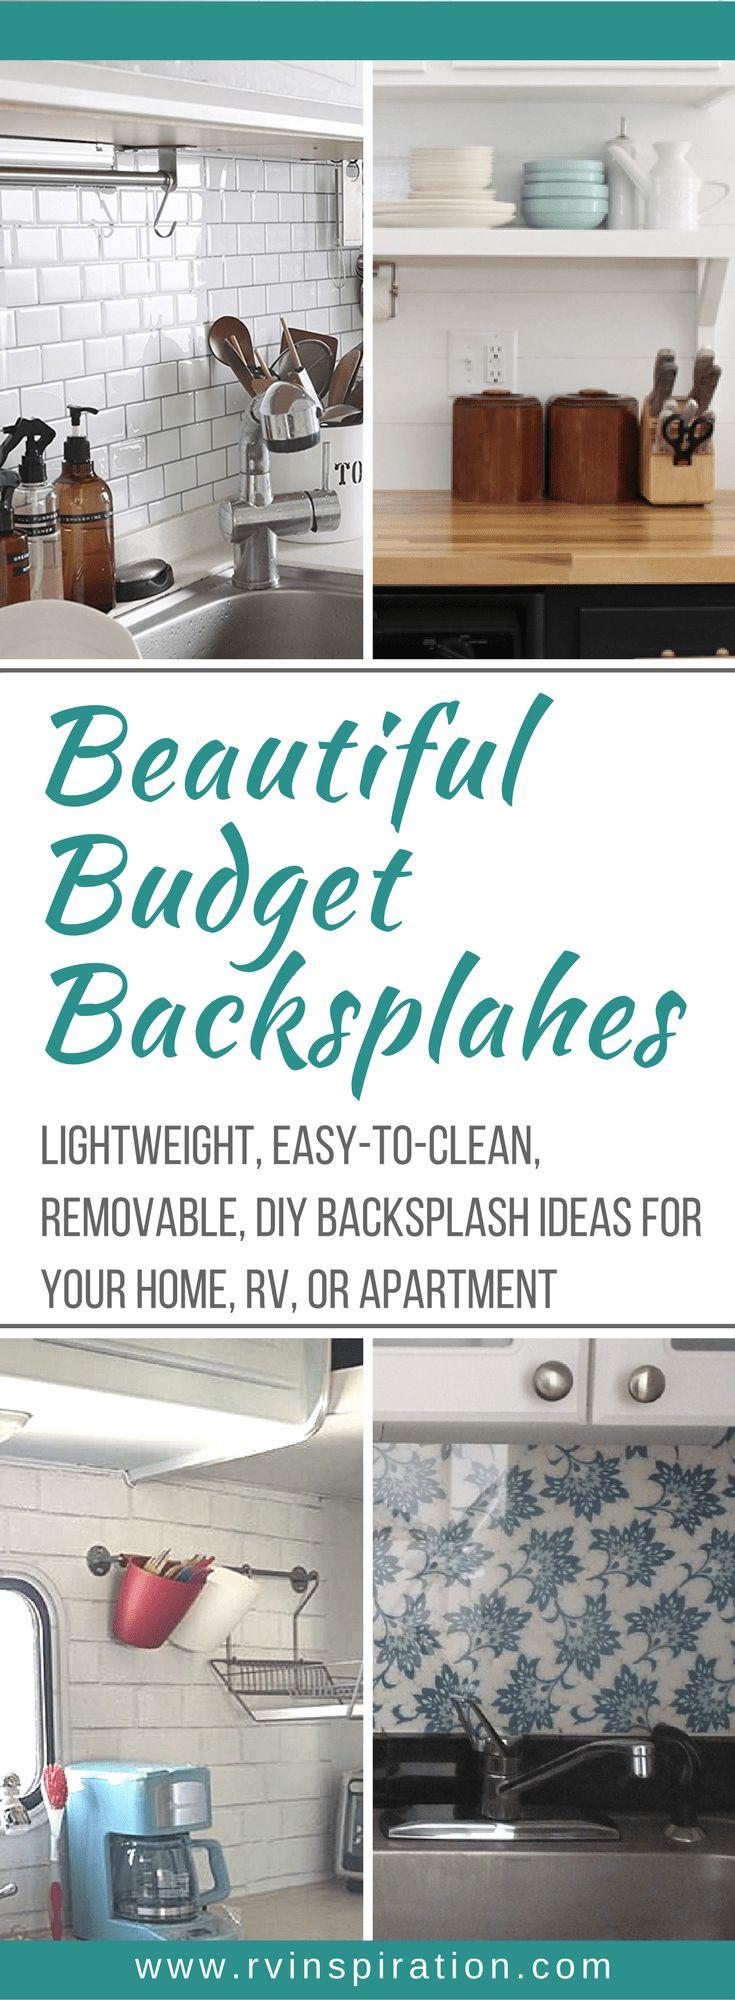 Co co contact paper backsplash - Beautiful Budget Backsplashes For Rvs